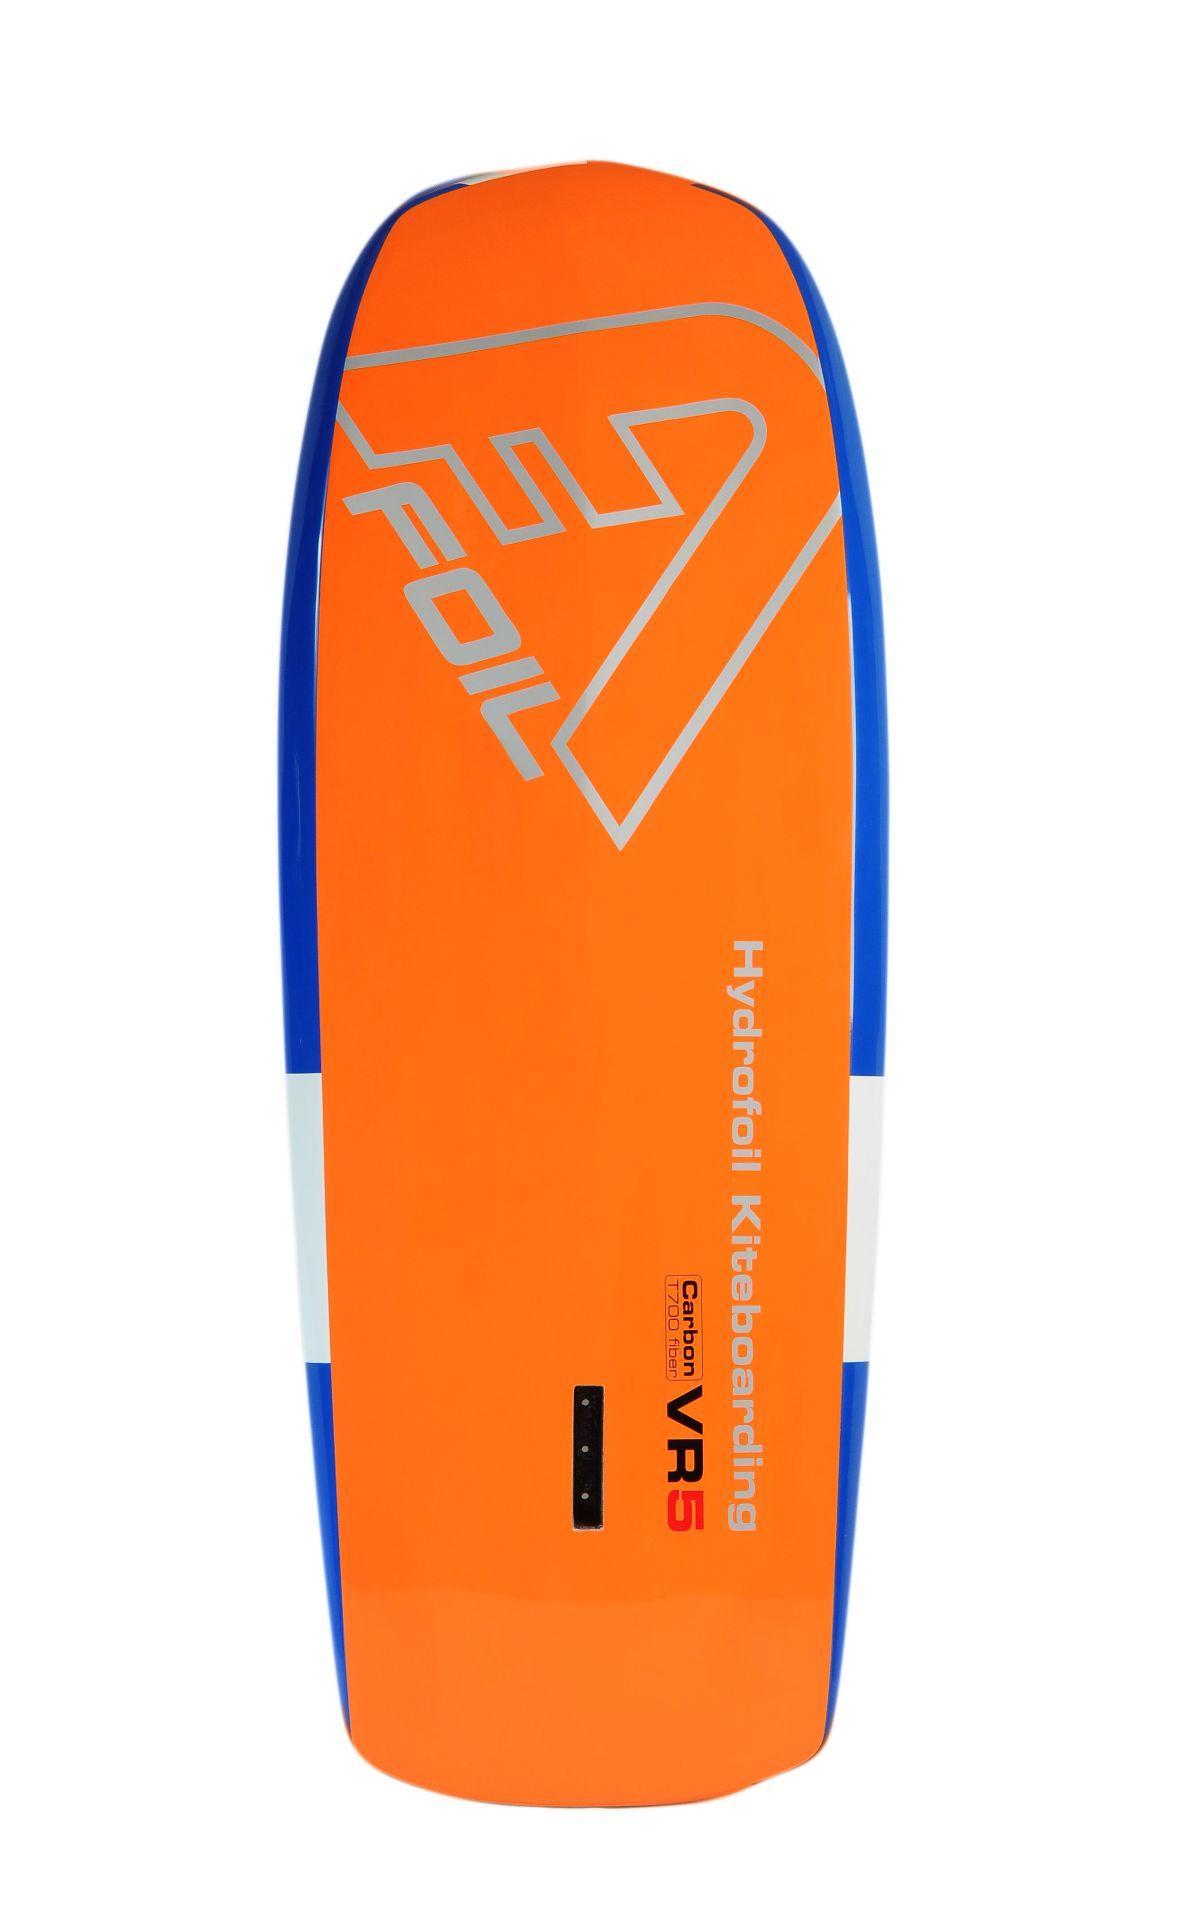 Kitefoil foilboard alpinefoil vr5 2 1